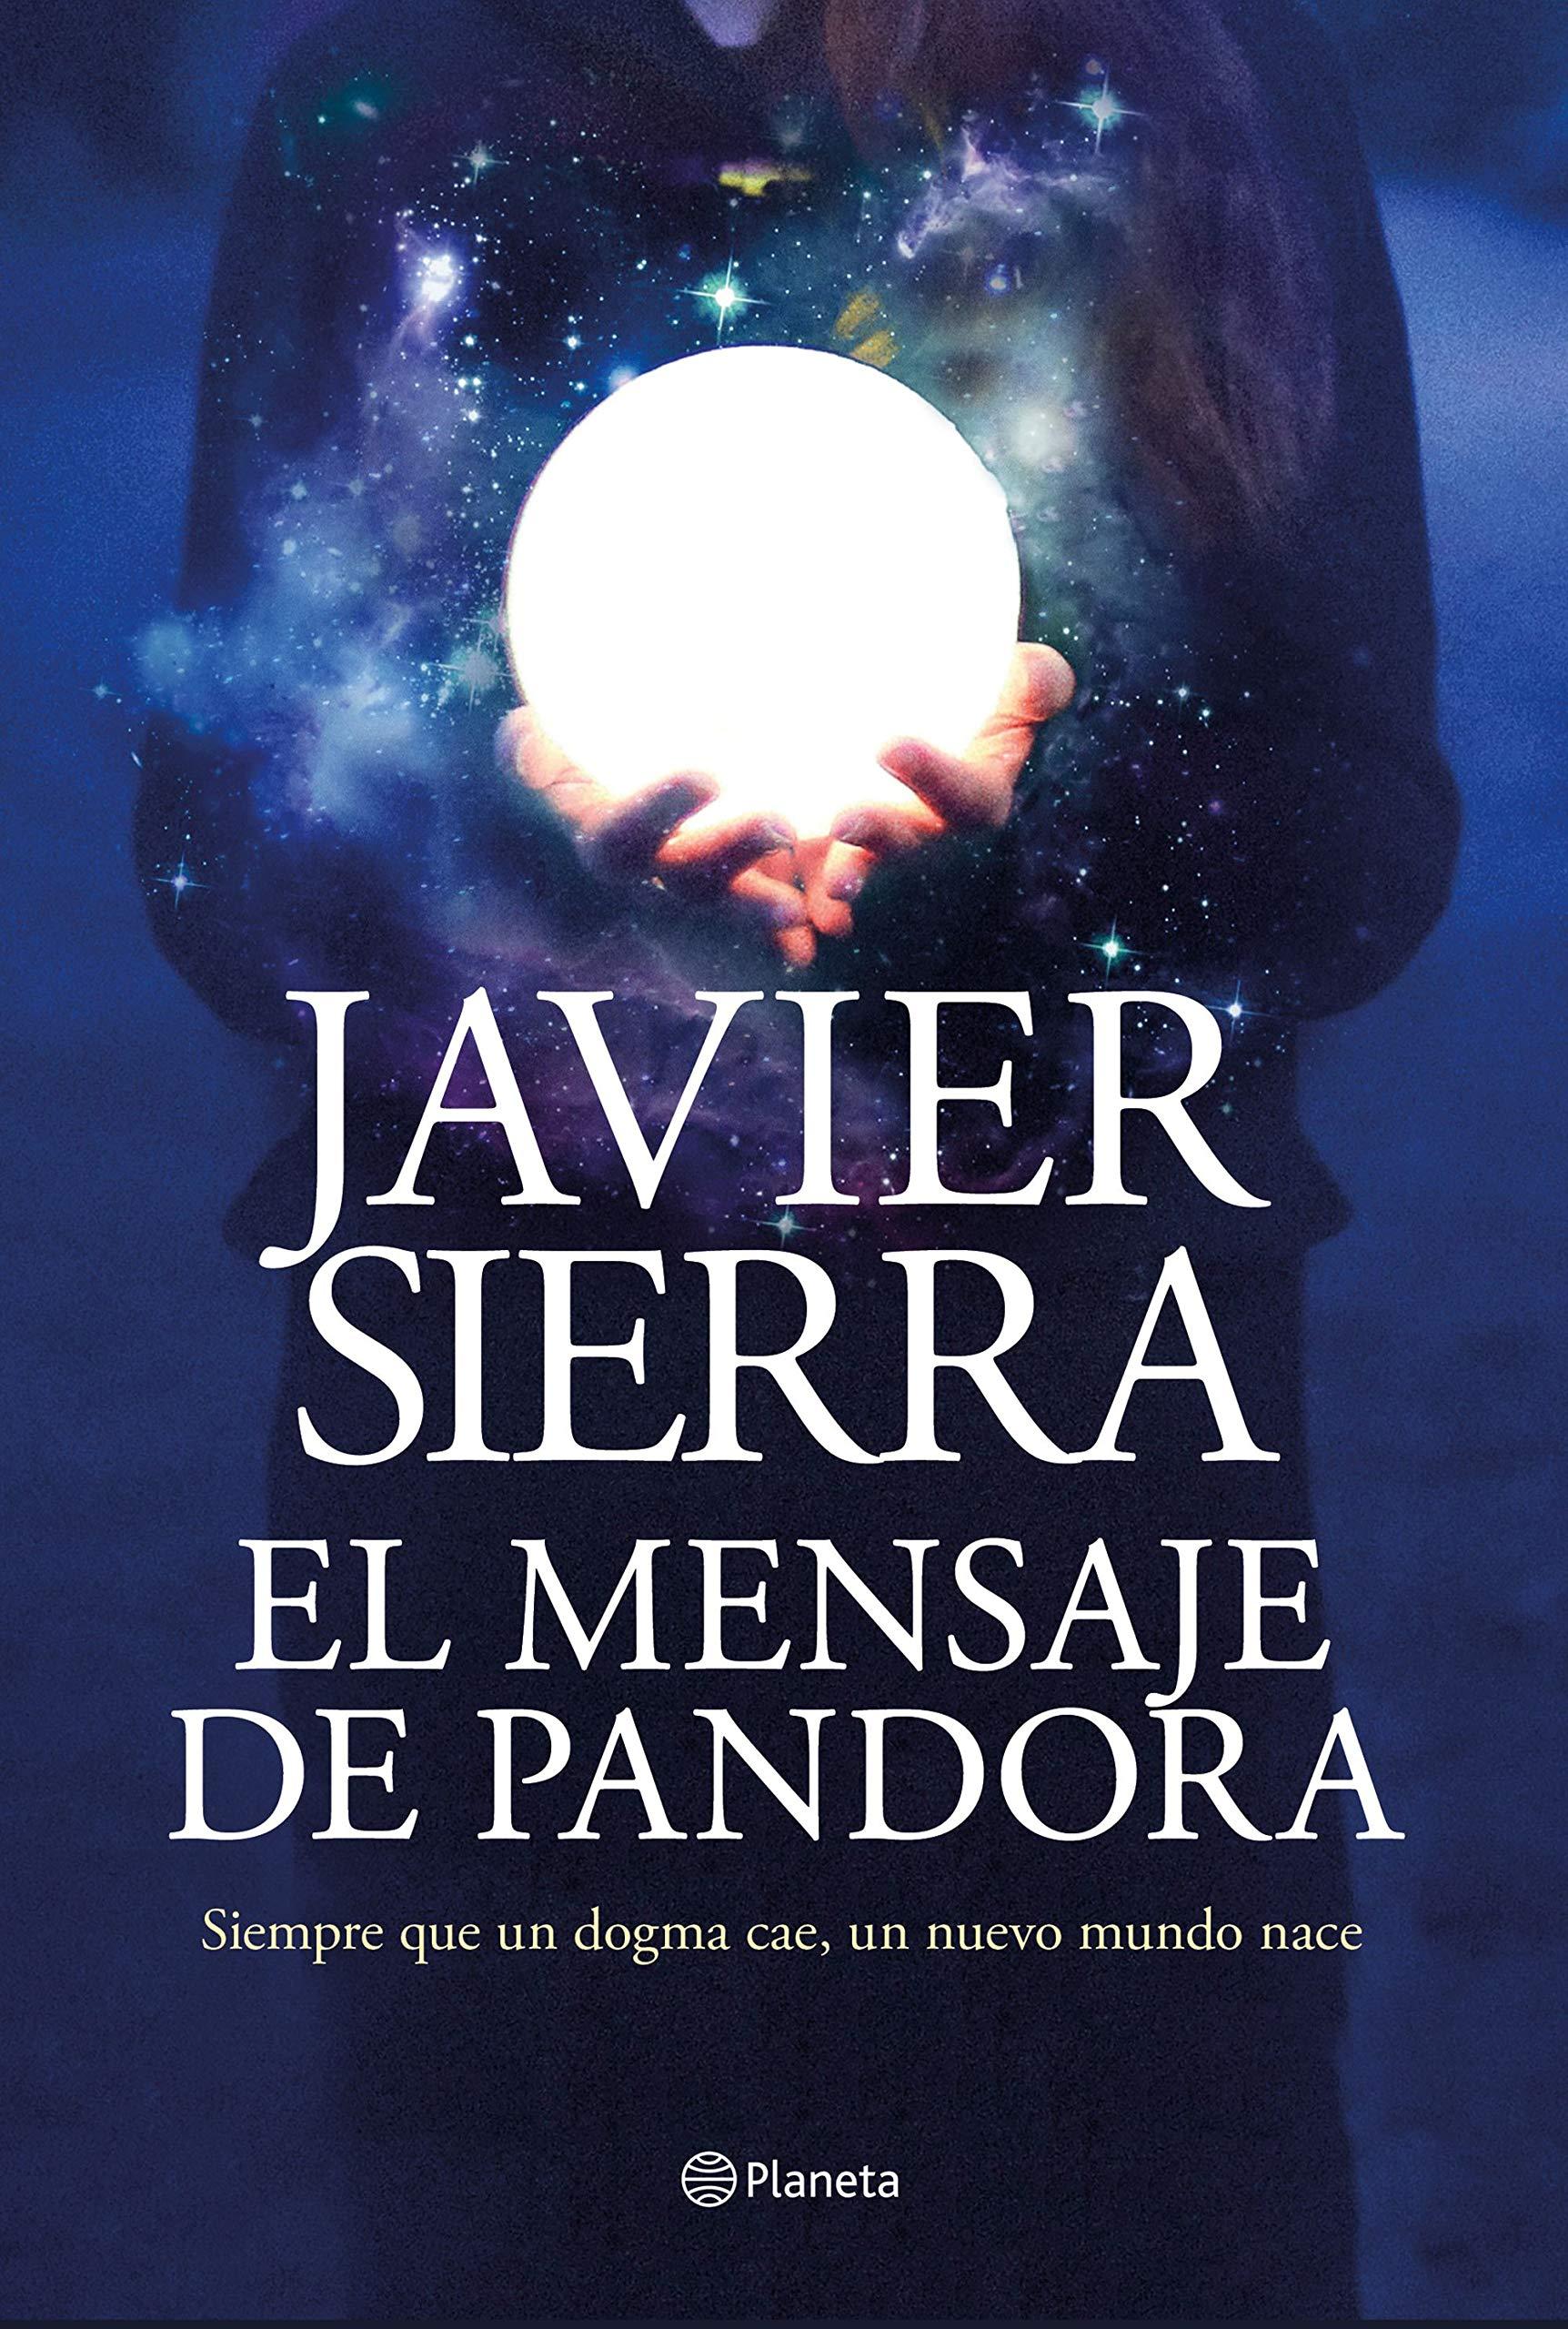 El mensaje de Pandora, de Javier Sierra.